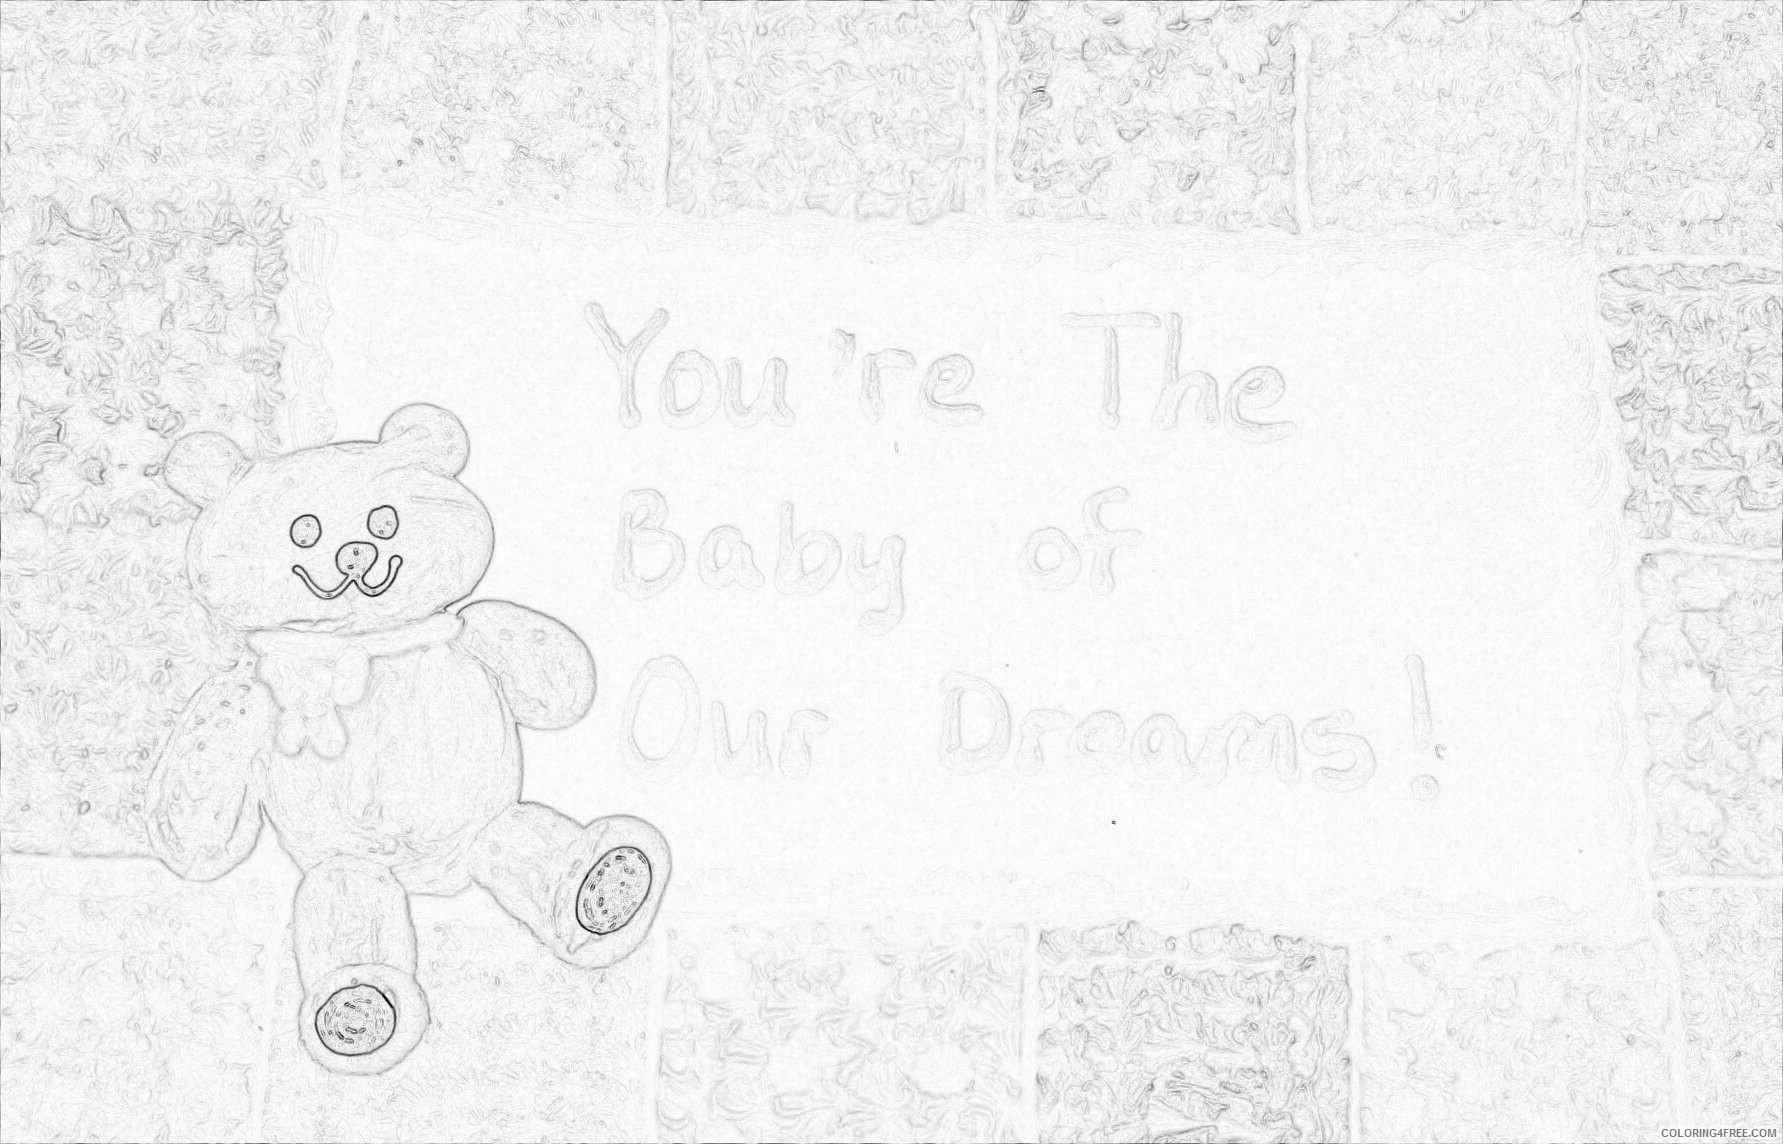 3d bear on sheet cake peCETR coloring